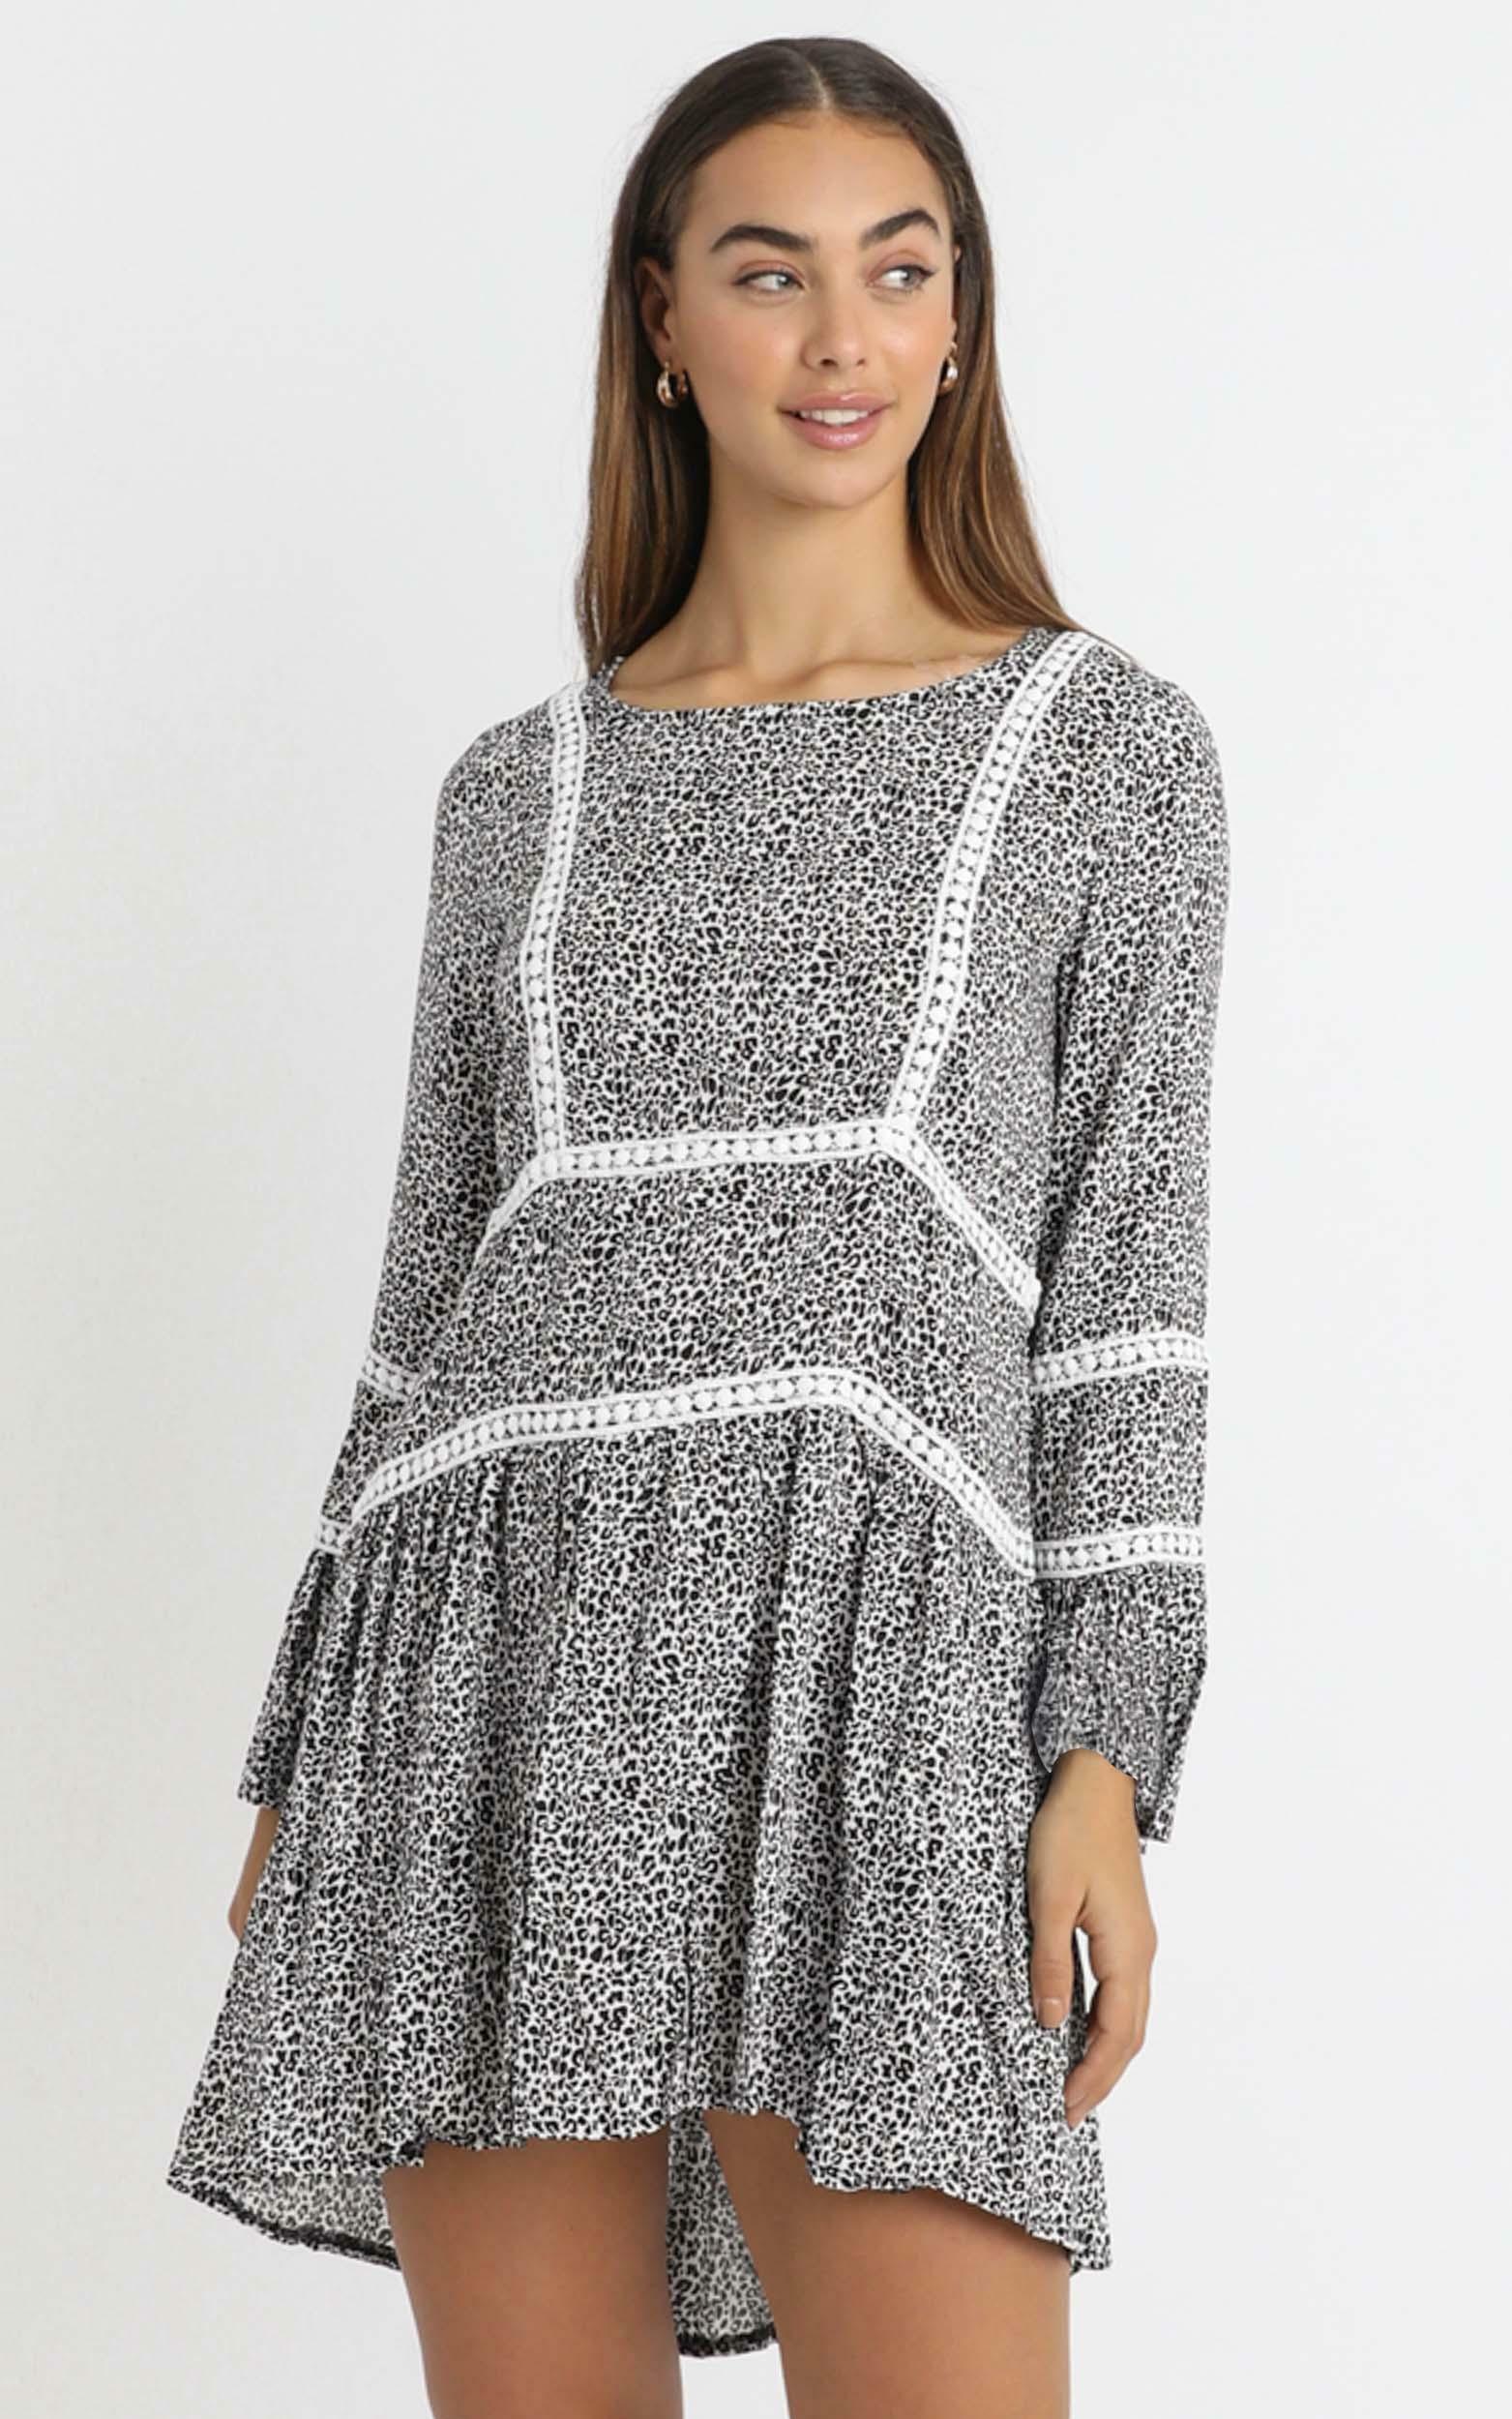 Edina Dress in Leopard - 14 (XL), BLK1, hi-res image number null